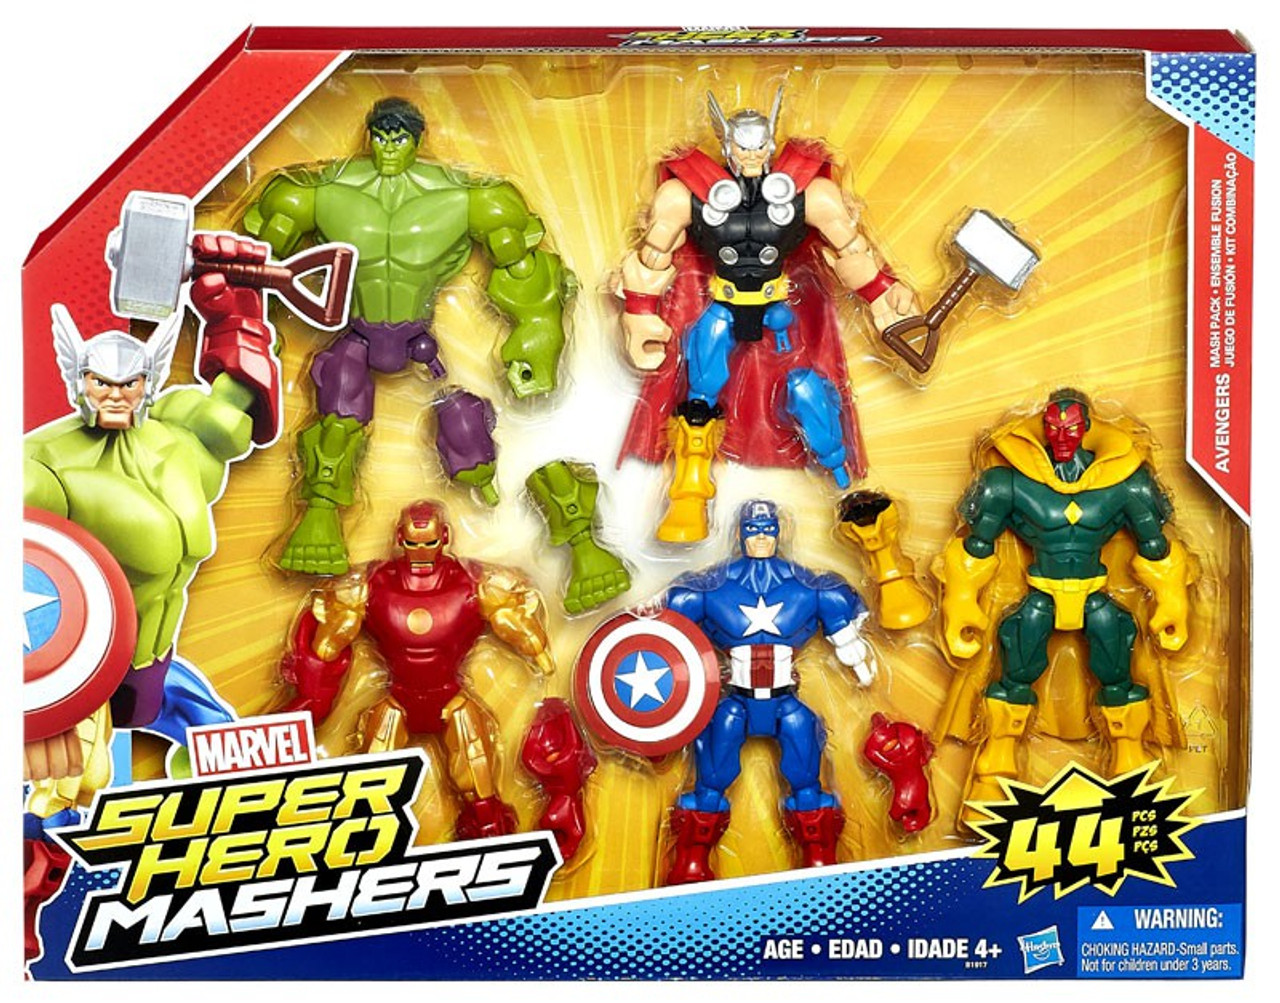 Marvel Super Hero Mashers Battle Mash Pack Captain America b5a70c8e6b